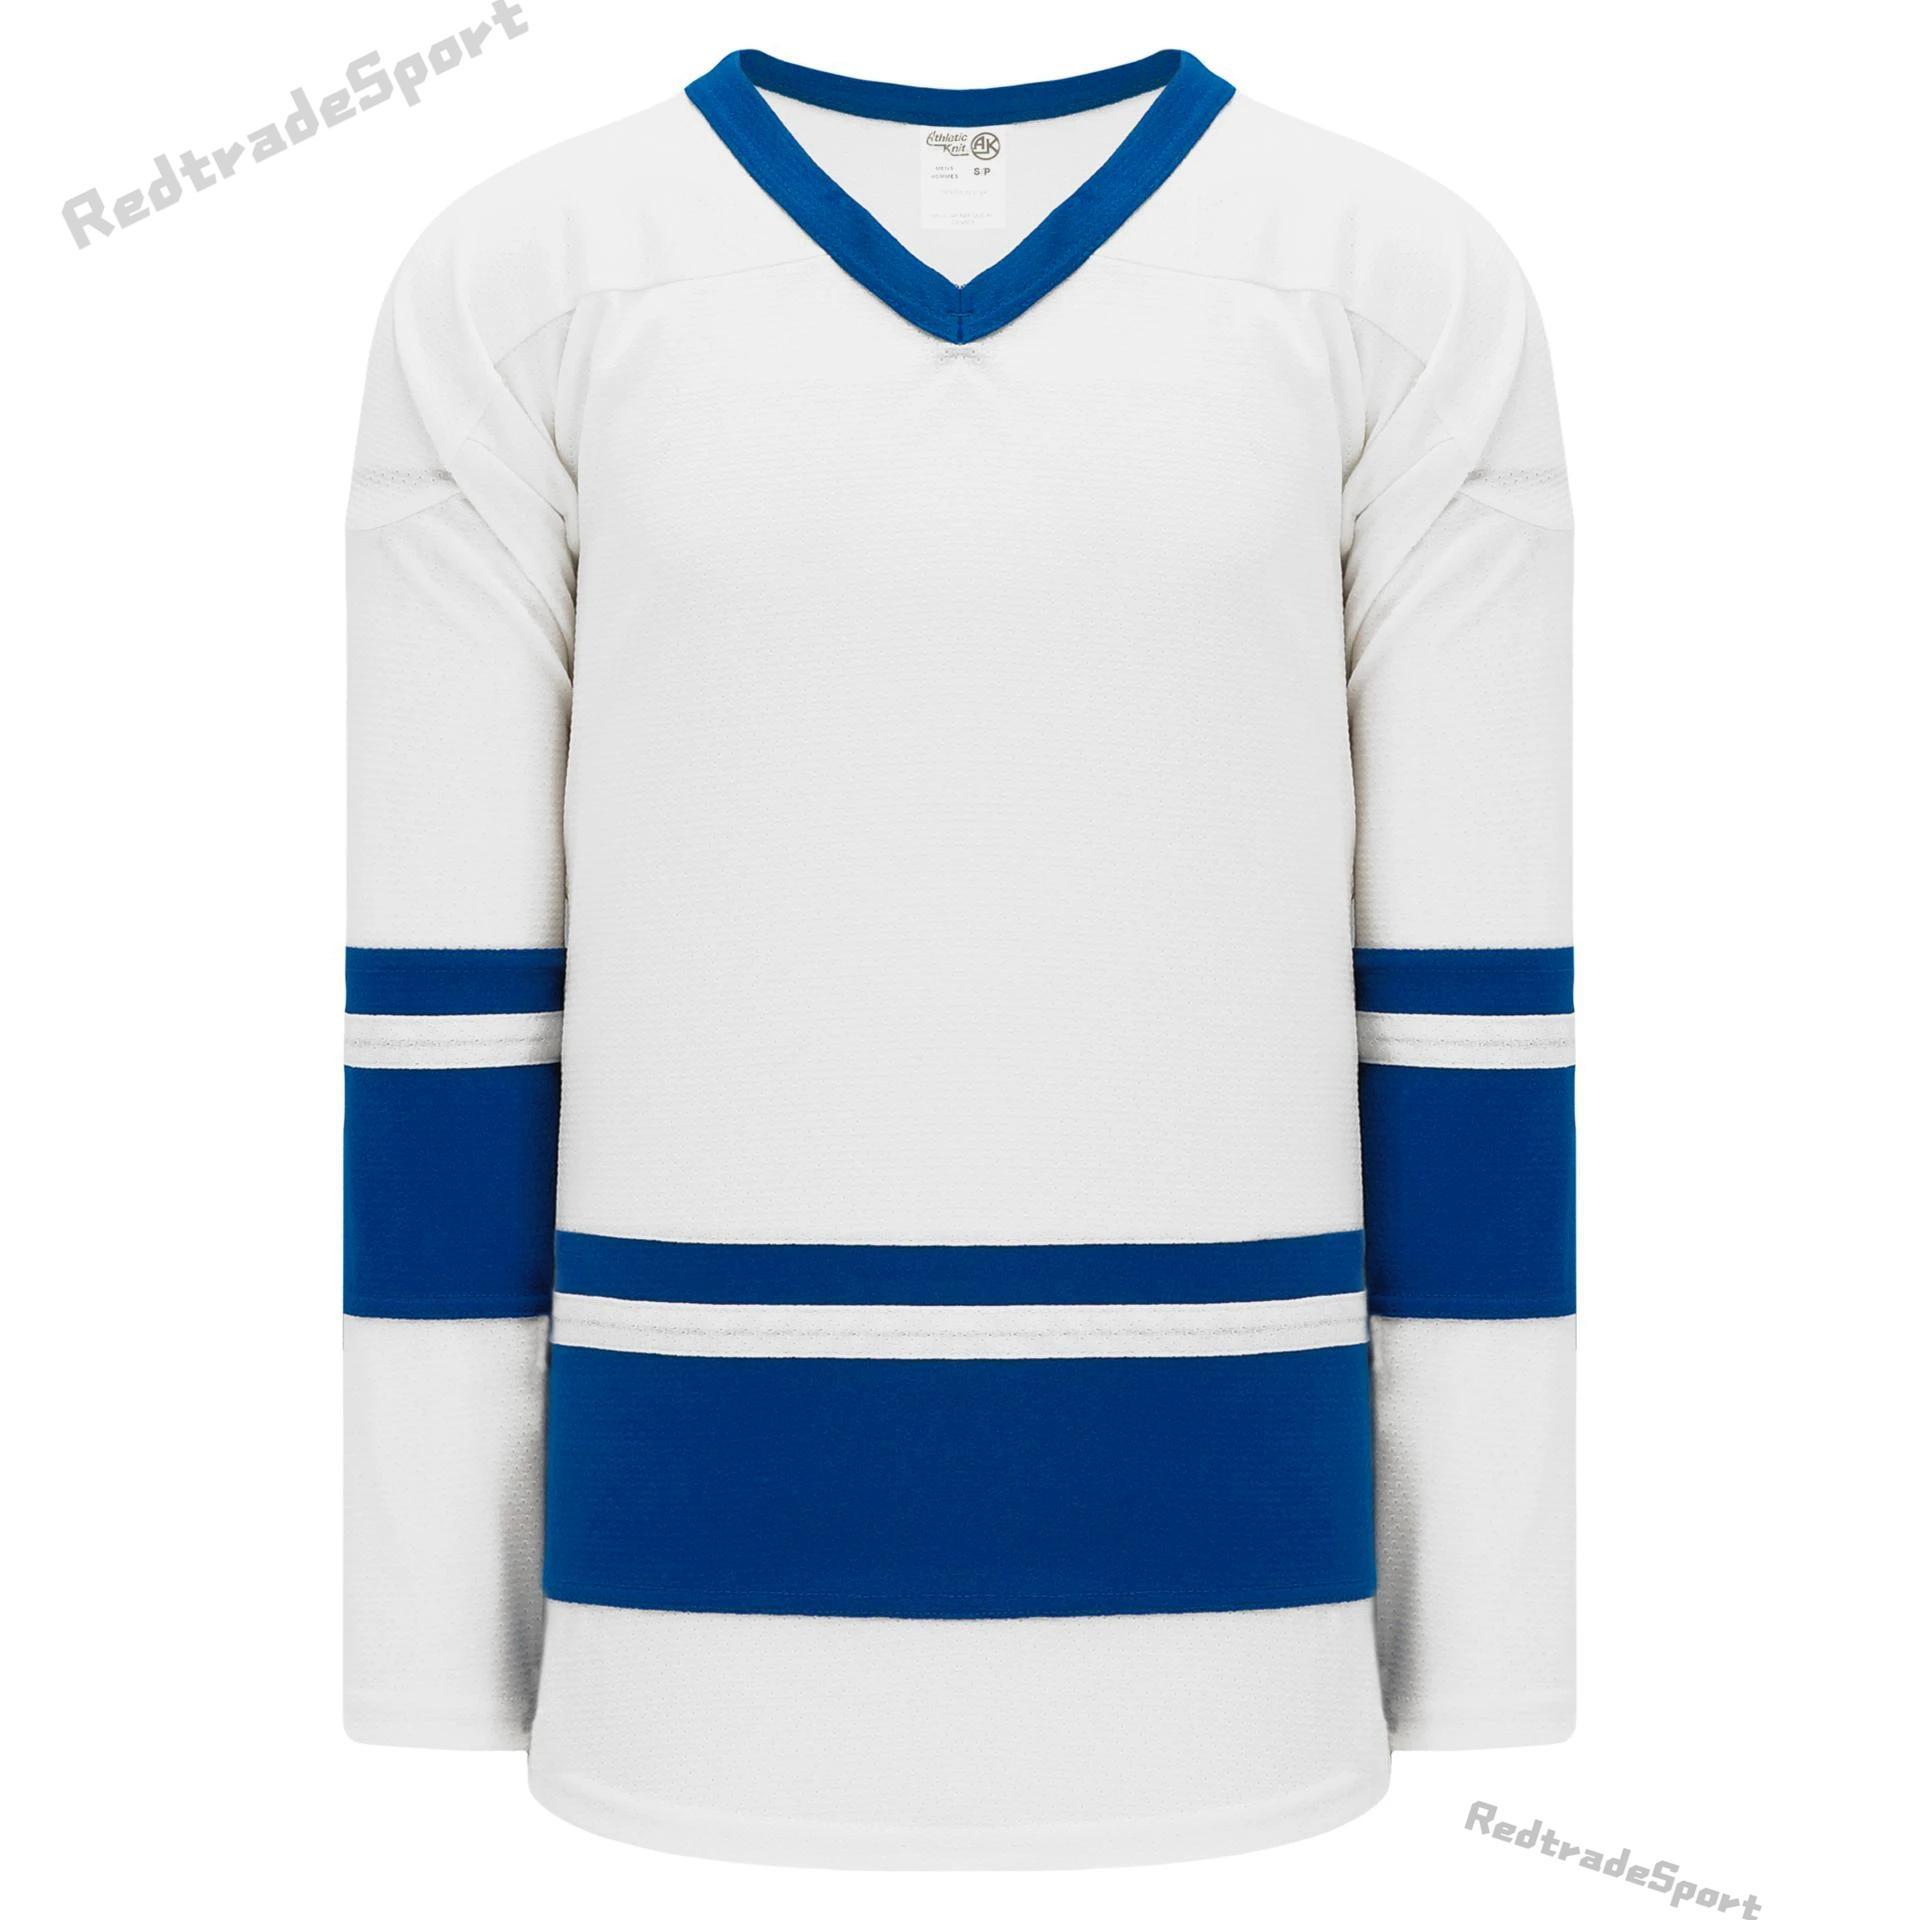 2021 Reveo Columuekets Hockey Jerseys 71 Nicgno (C) 13 Cakinson Red Hocrseys 스티치 스티치 셔츠 망 흑백